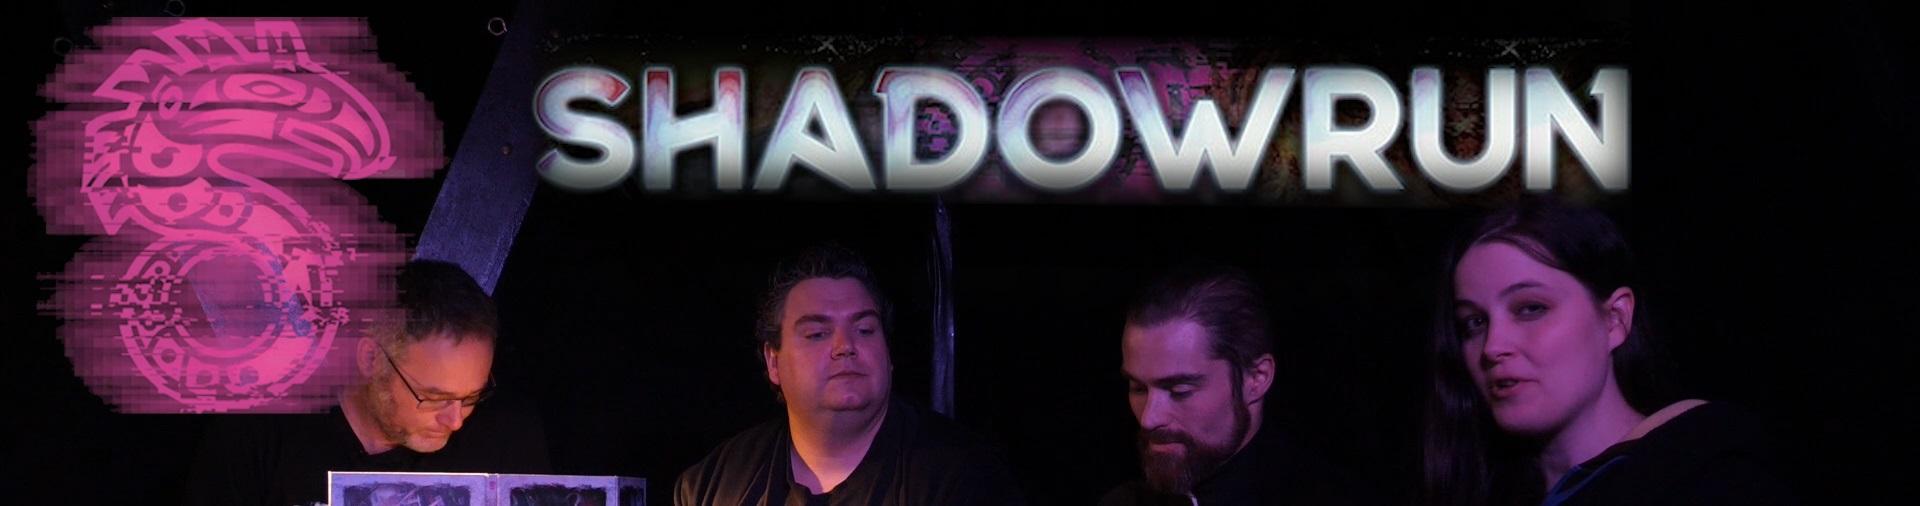 Shadowrun Live-Show im The Cave Frankfurt